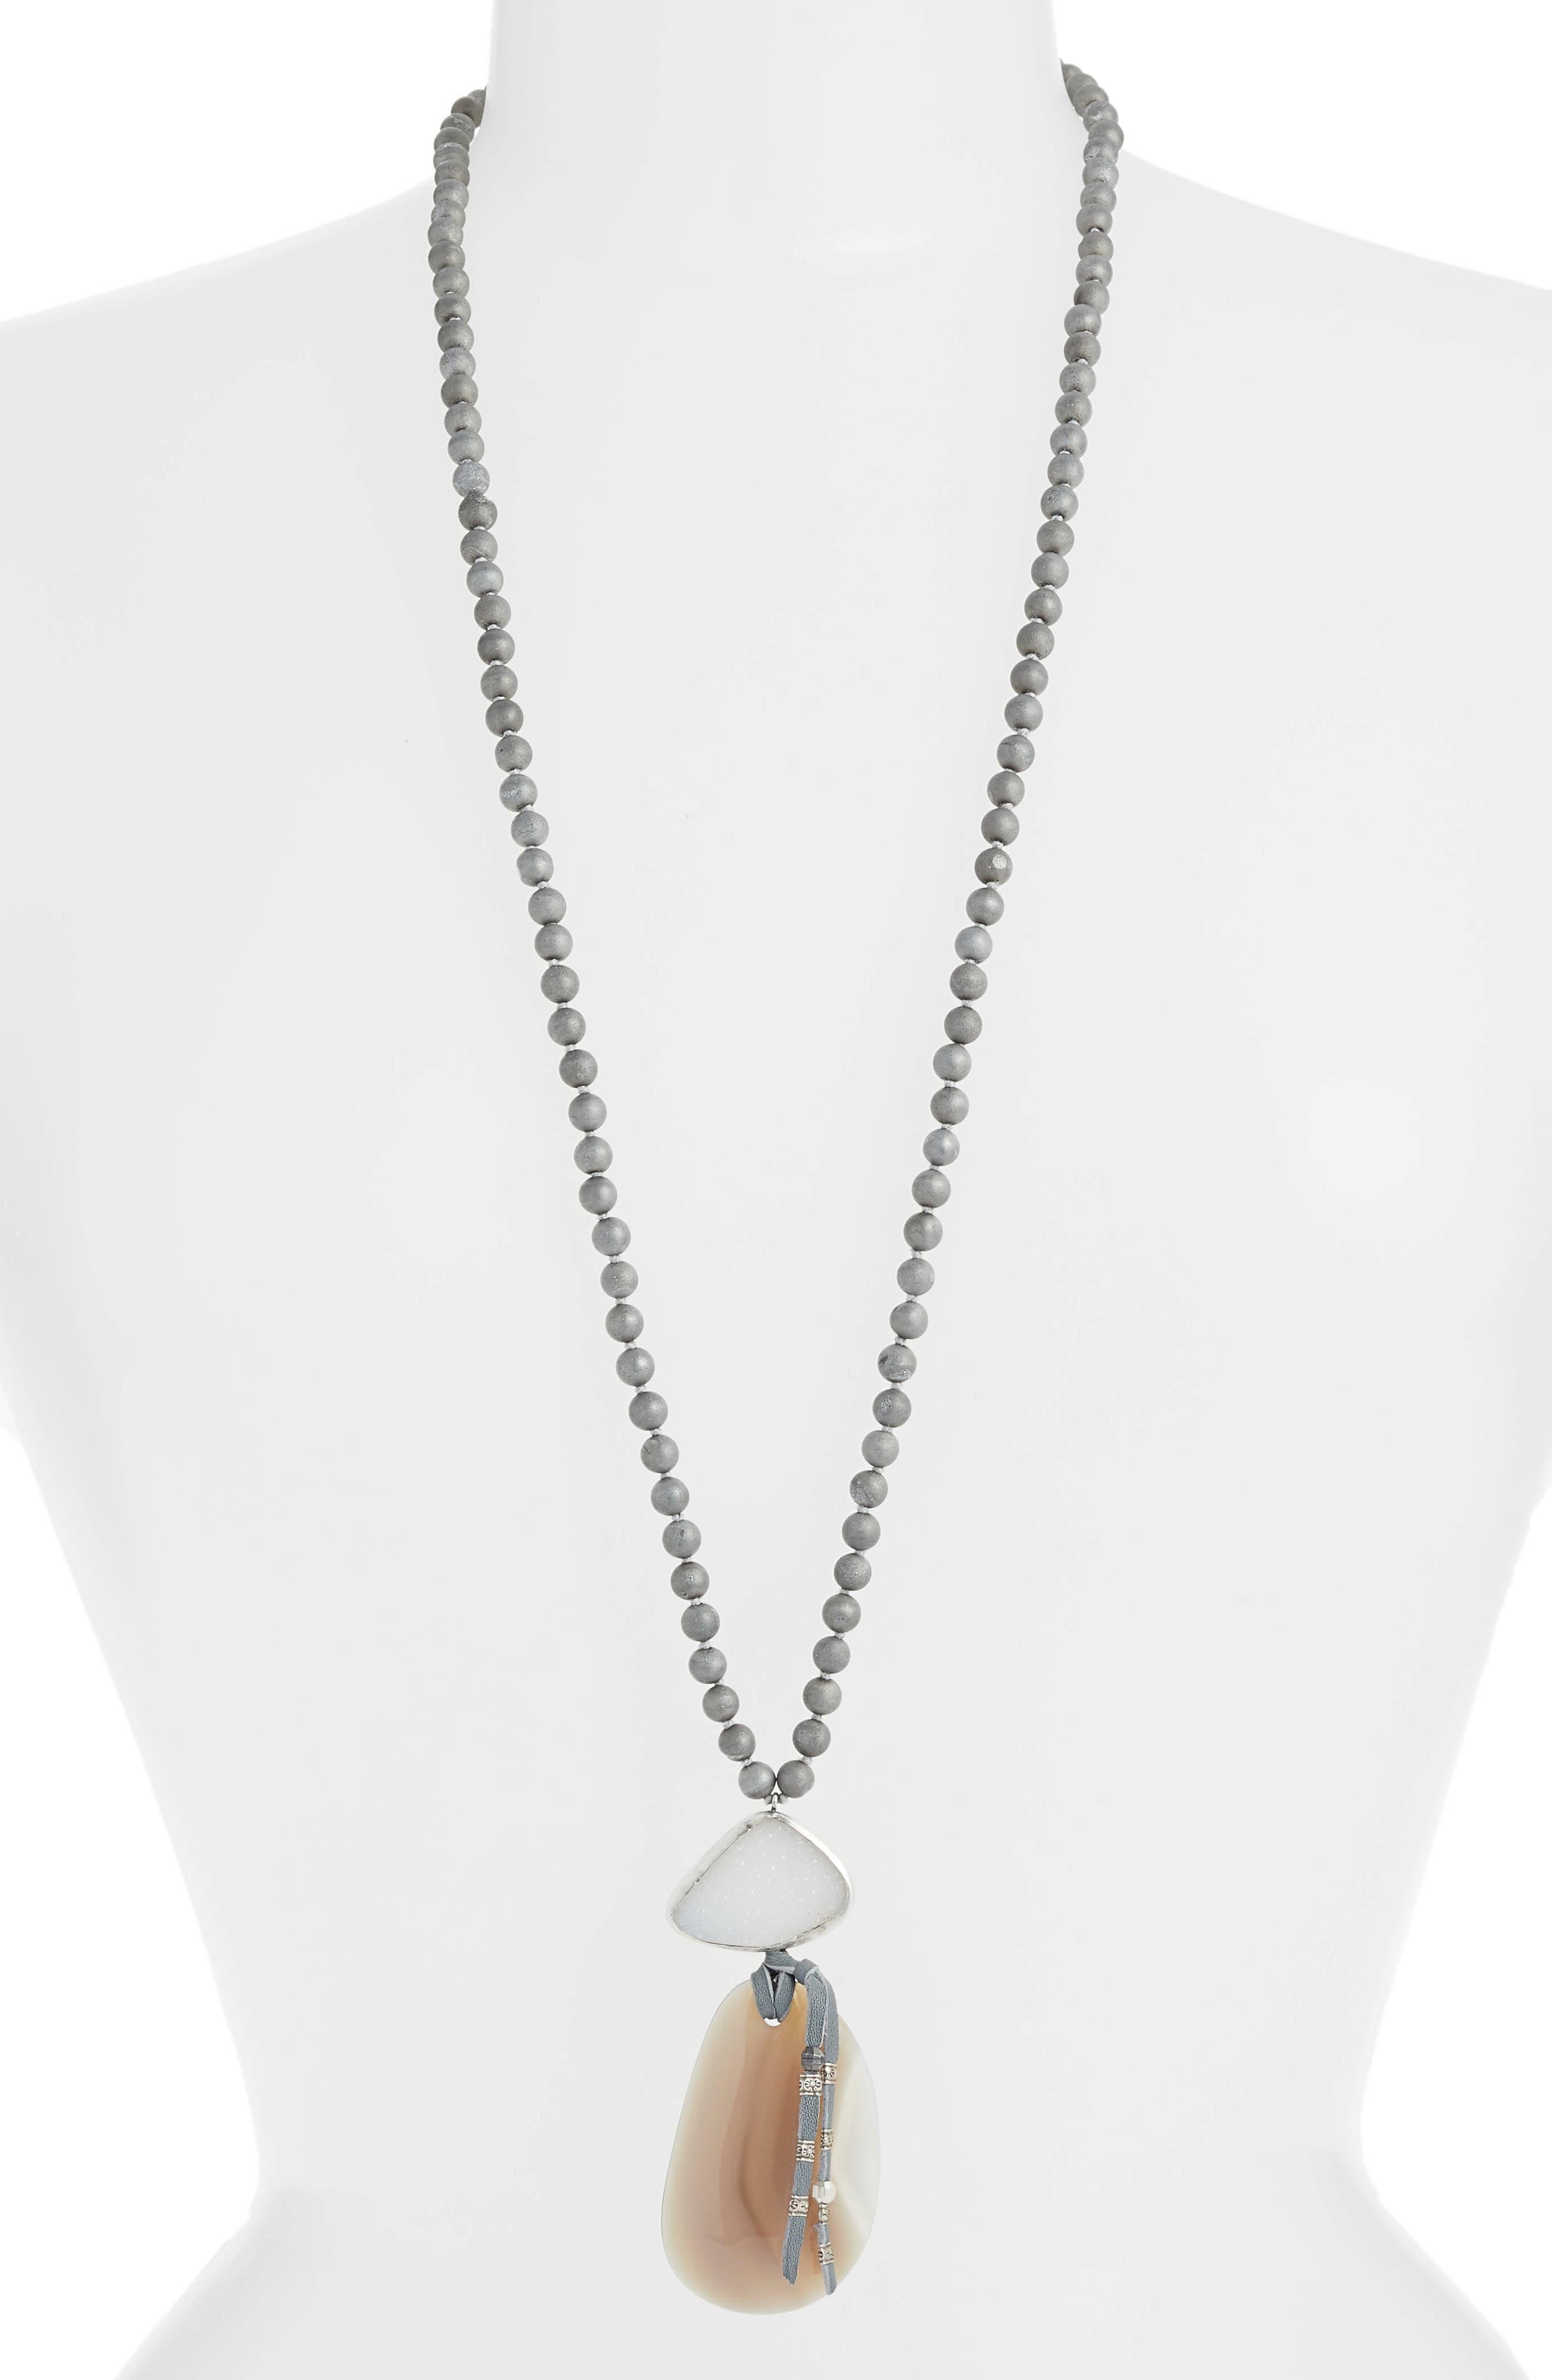 Silver Agate Statement Pendant Necklace,                         Main,                         color, Silver Agate